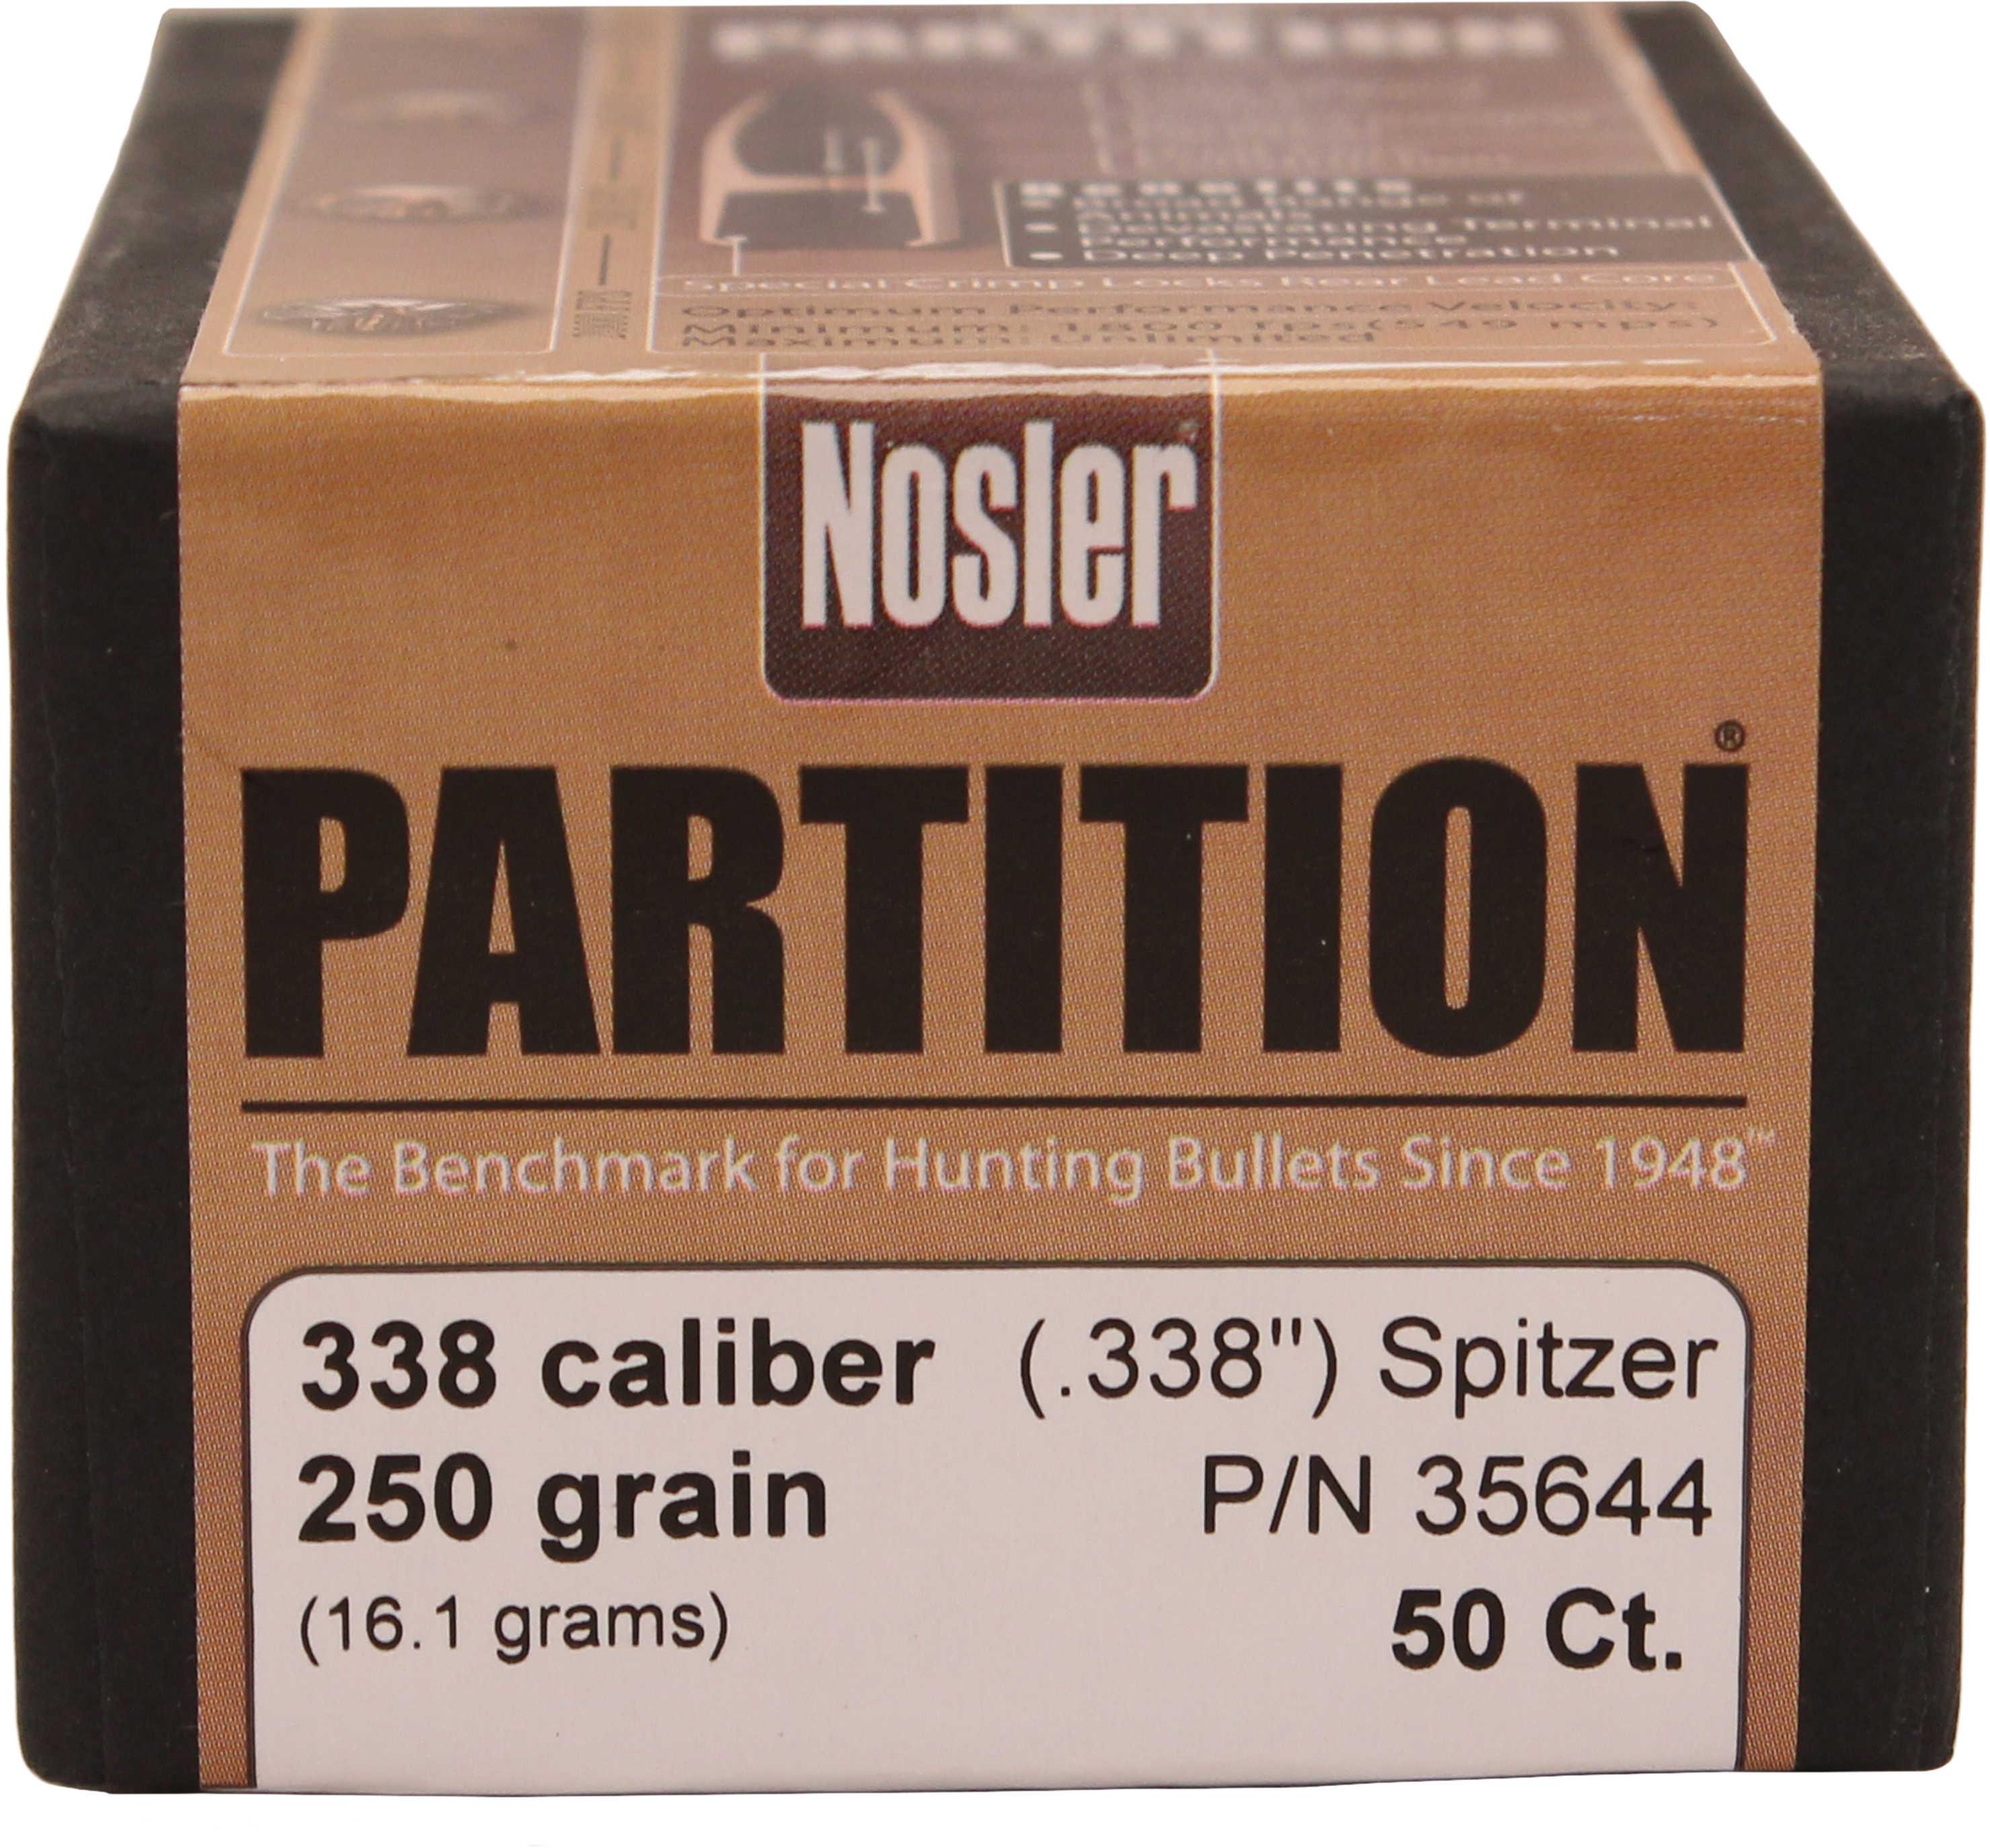 "Nosler 338 Caliber 250 Grains SP Part .338"" 50/Box Bullets 35644"